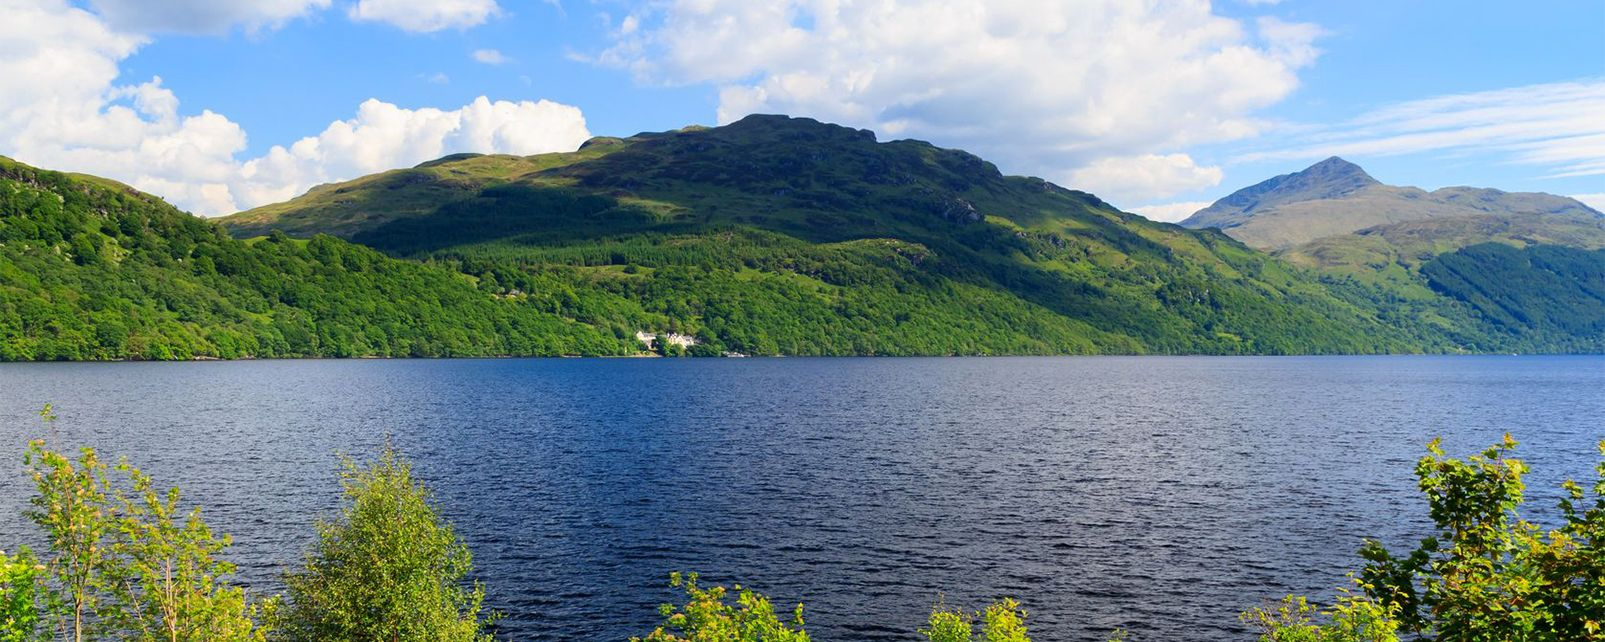 Loch Lomond And Trossachs National Park Scotland